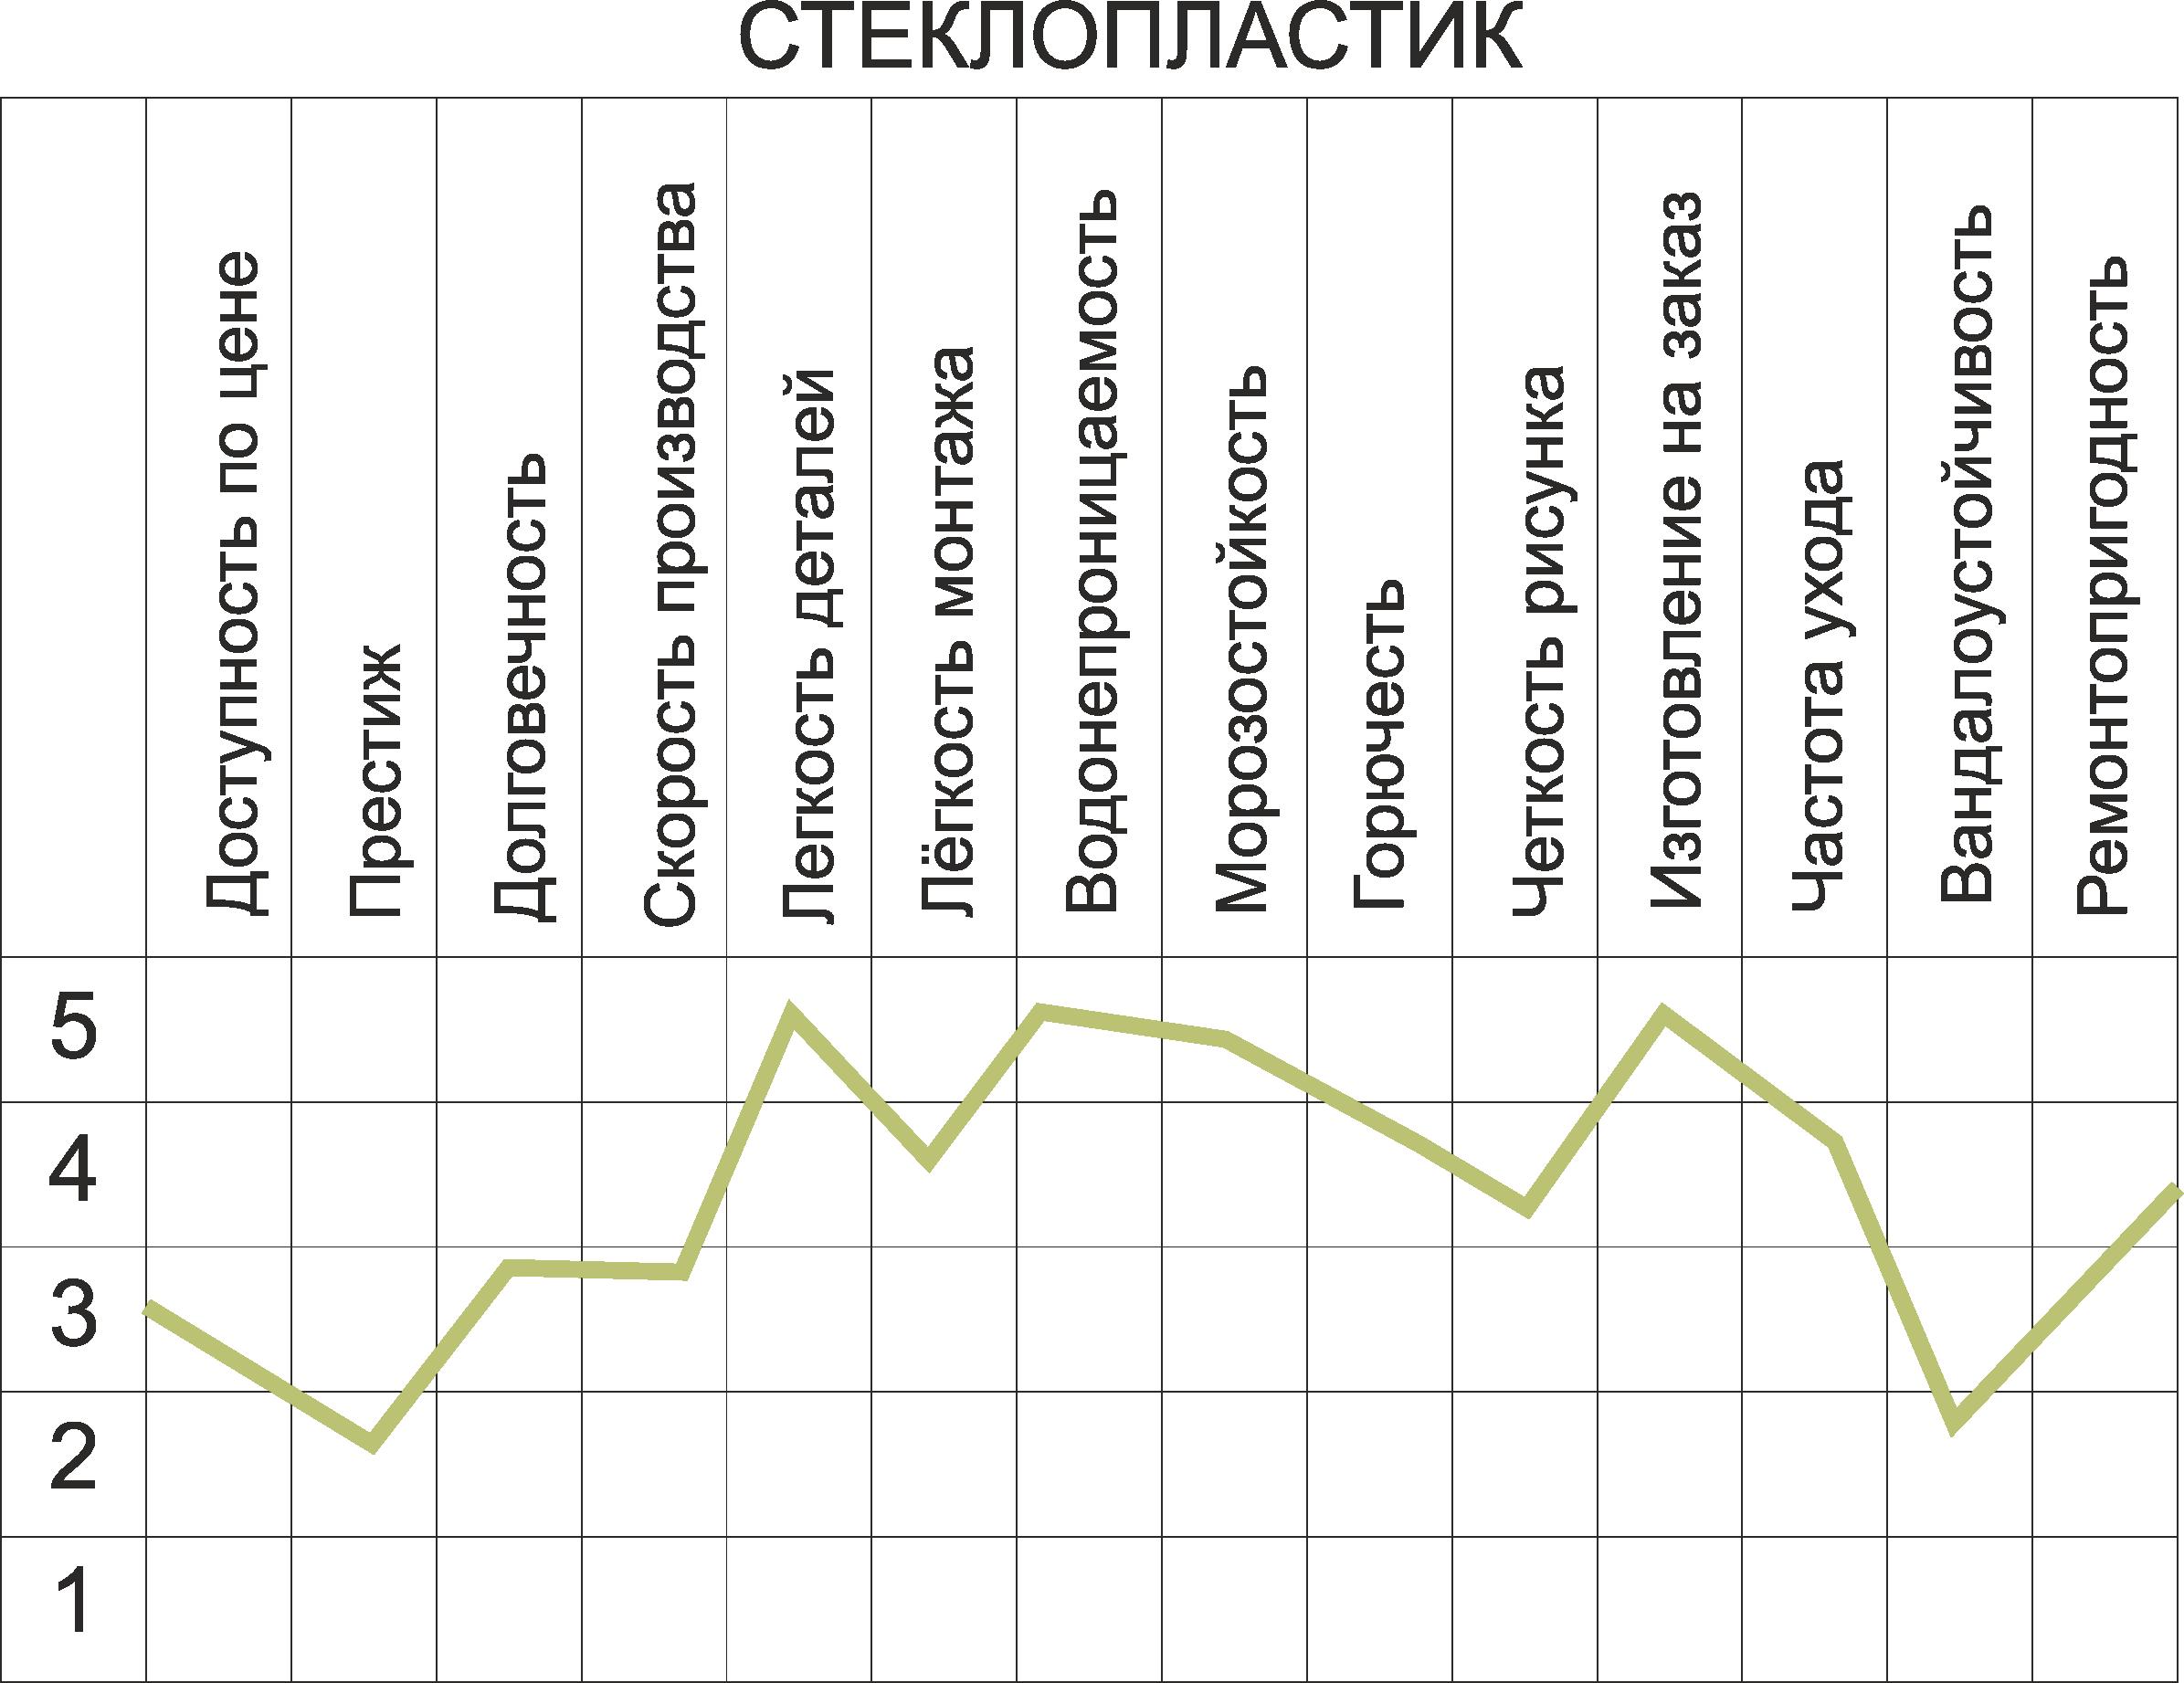 График характеристик декора из стеклопластика